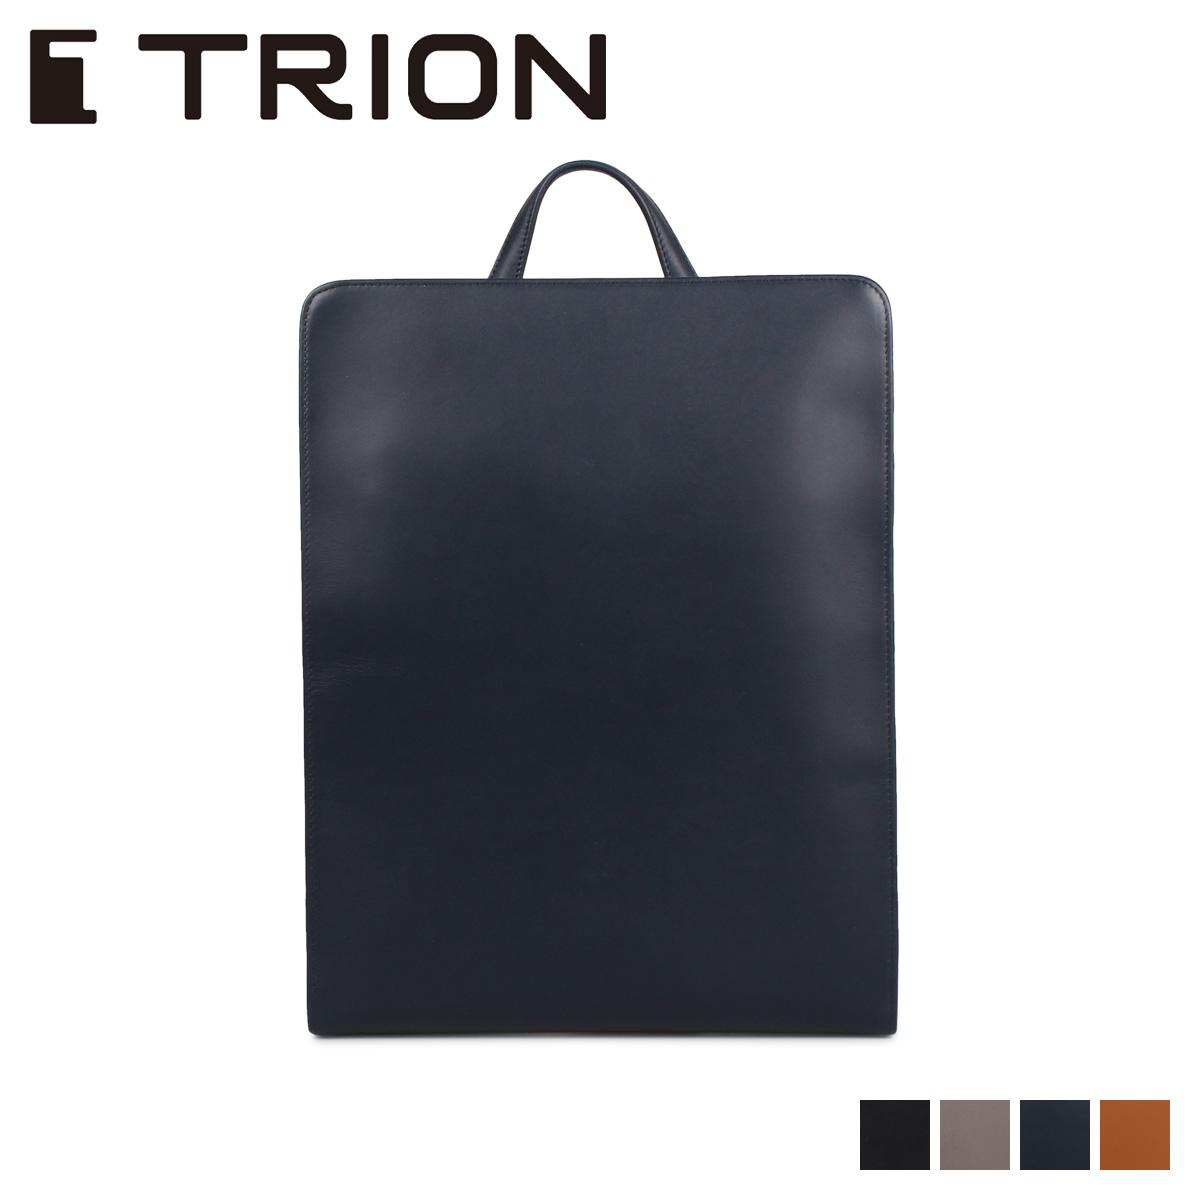 TRION トライオン リュック バッグ バックパック メンズ DOCUMENT ブラック ダーク グレー ネイビー ダーク ブラウン 黒 SA229